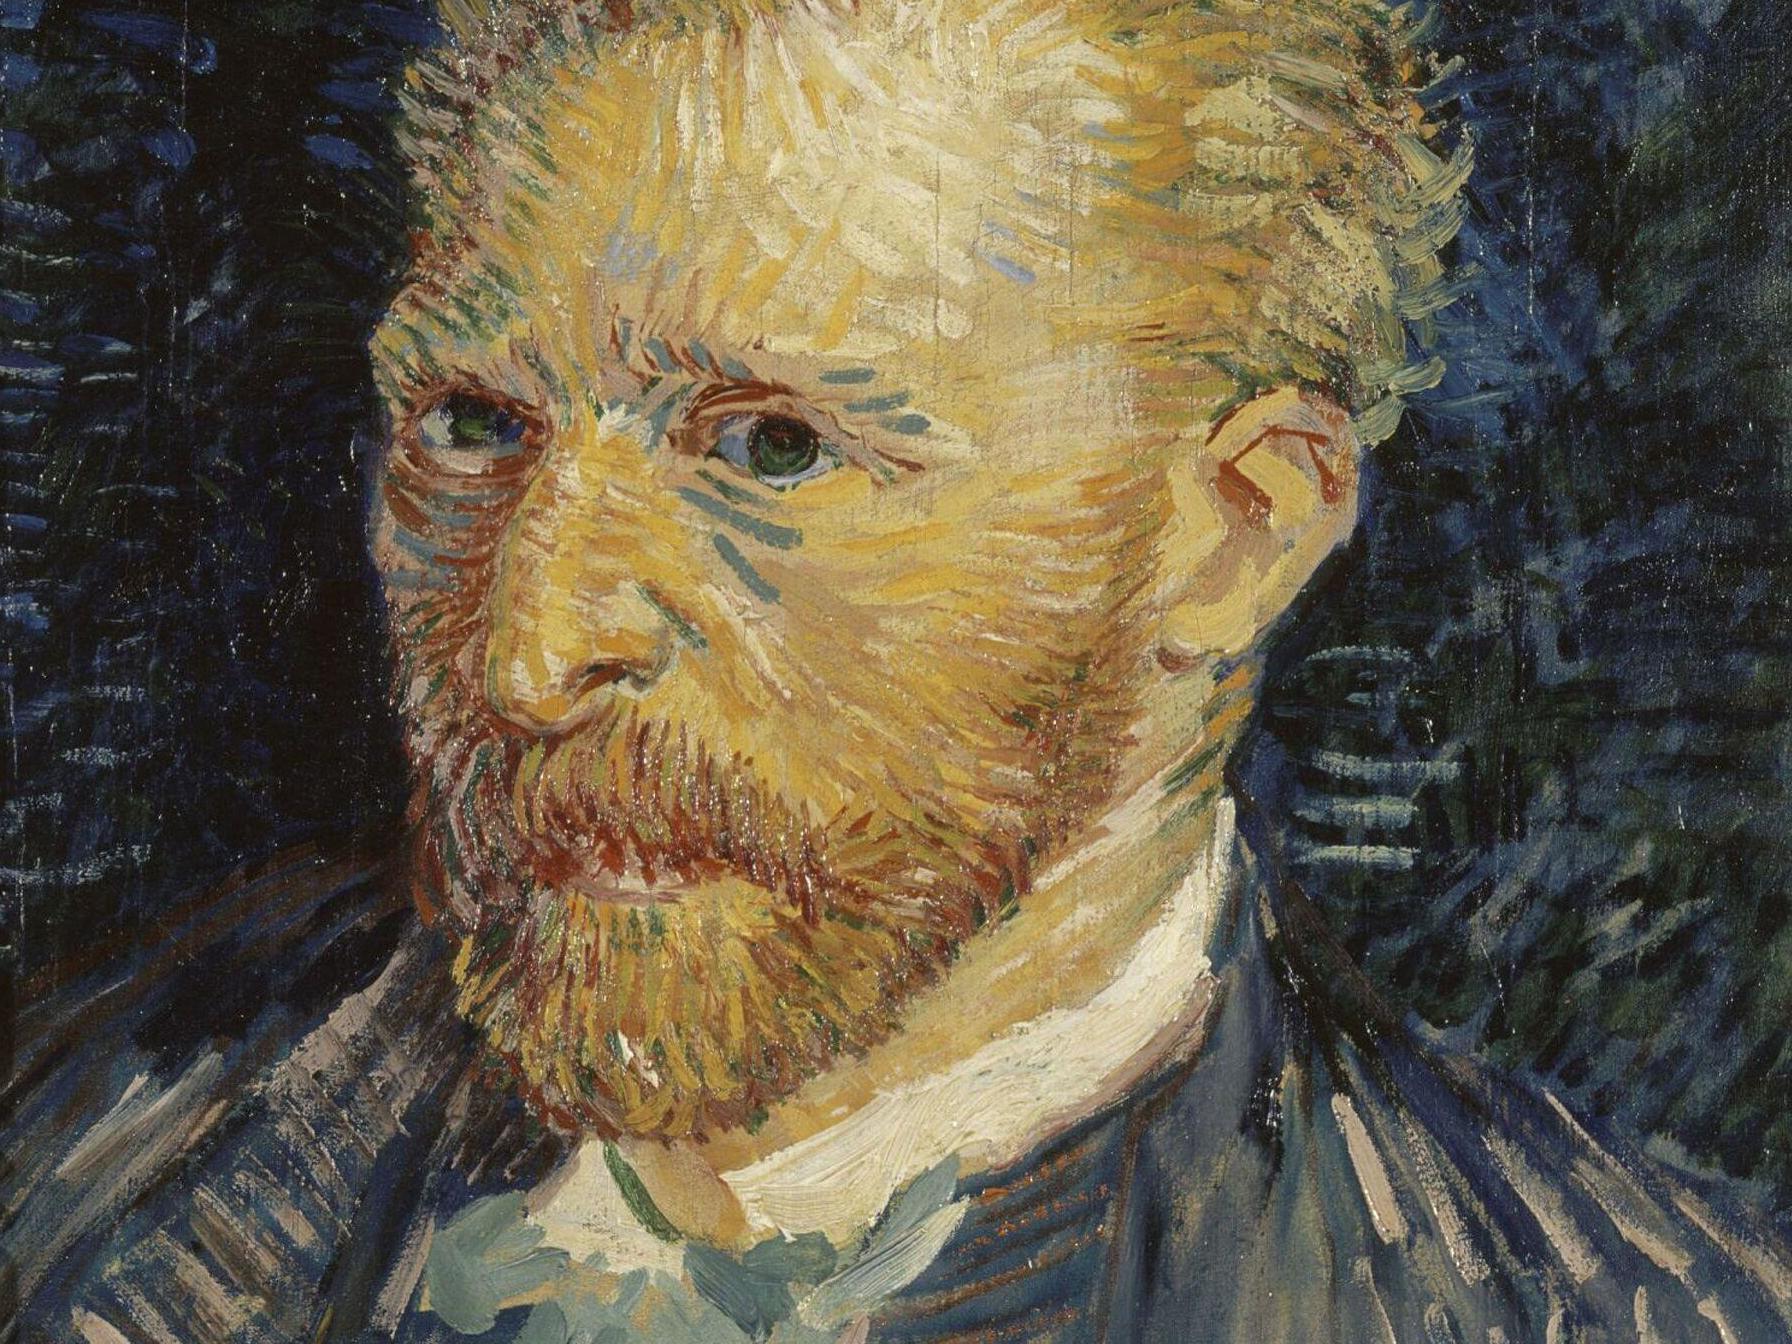 Portrait of the artist as a young man: Vincent